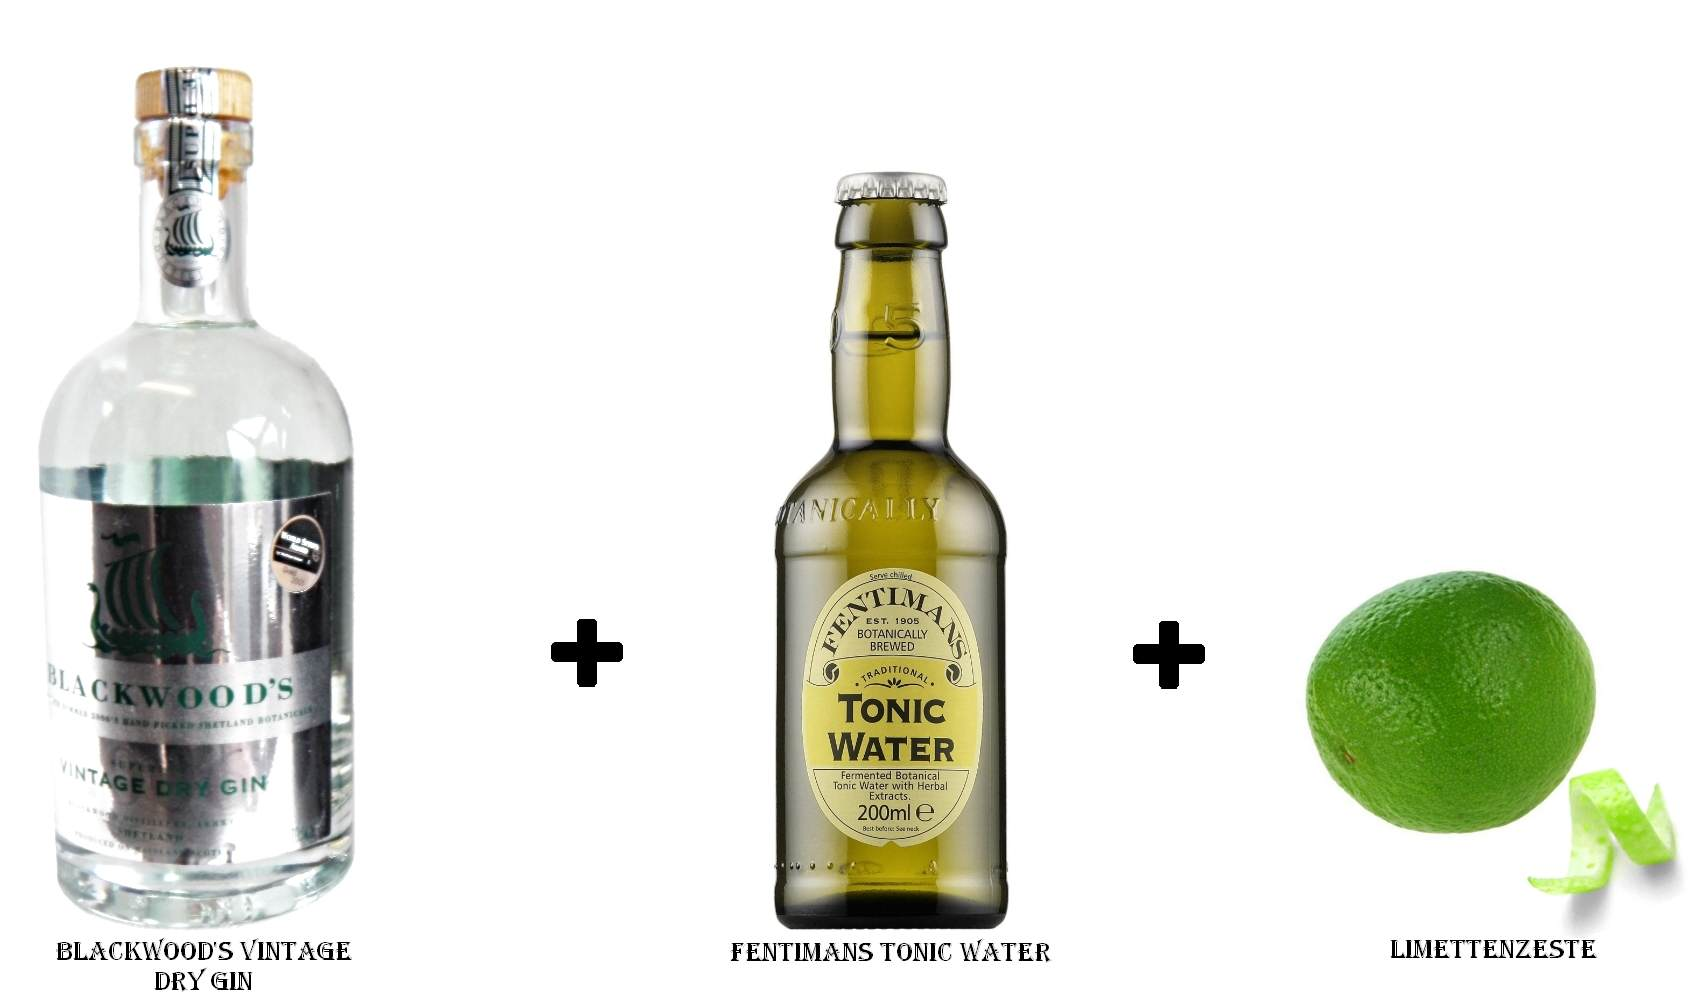 Blackwood's Vintage Dry Gin + Fentimans Tonic Water + Limettenzeste